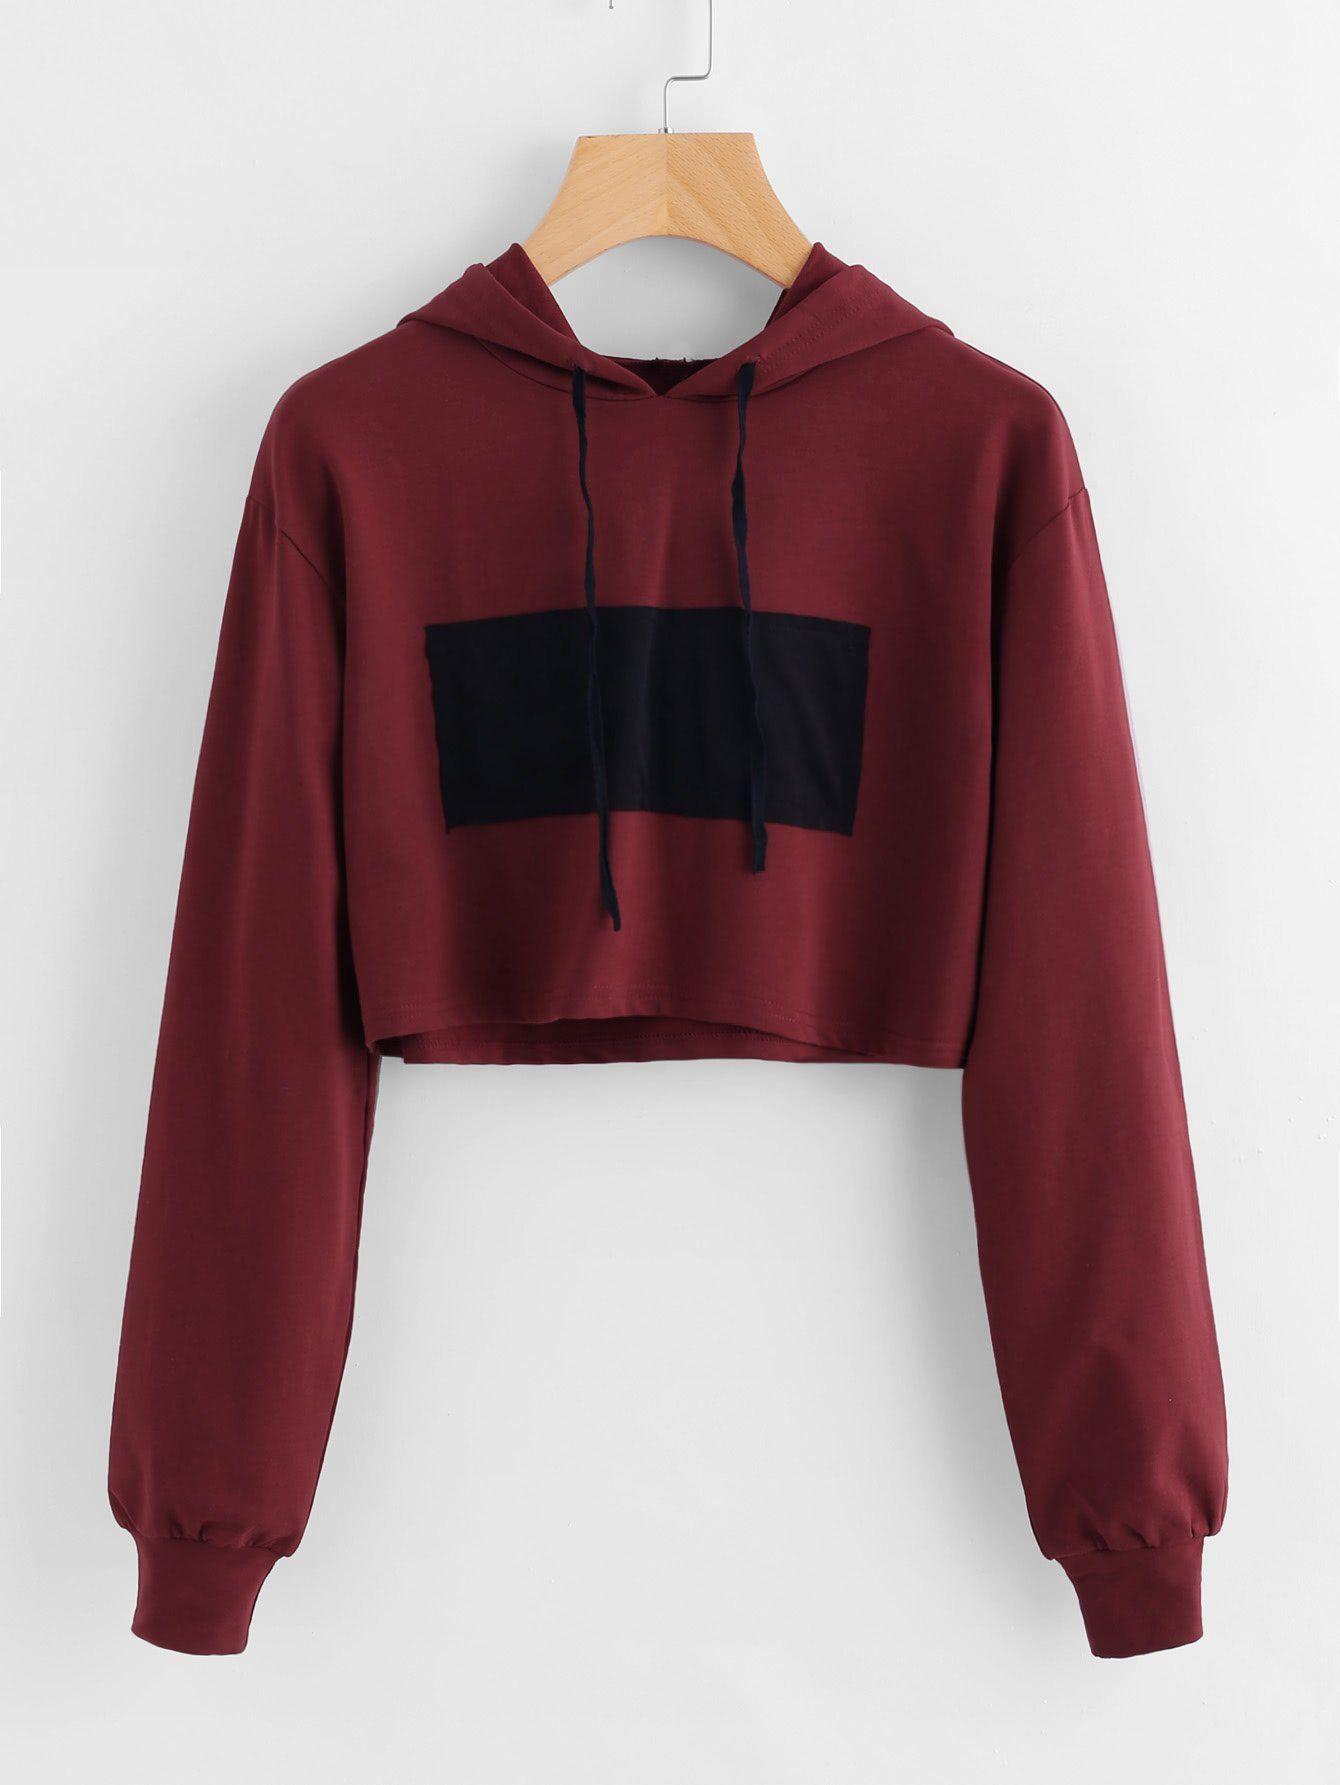 Material: 95% Polyester, 5% Spandex Color: Burgundy Pattern Type: Plain Neckline... 7